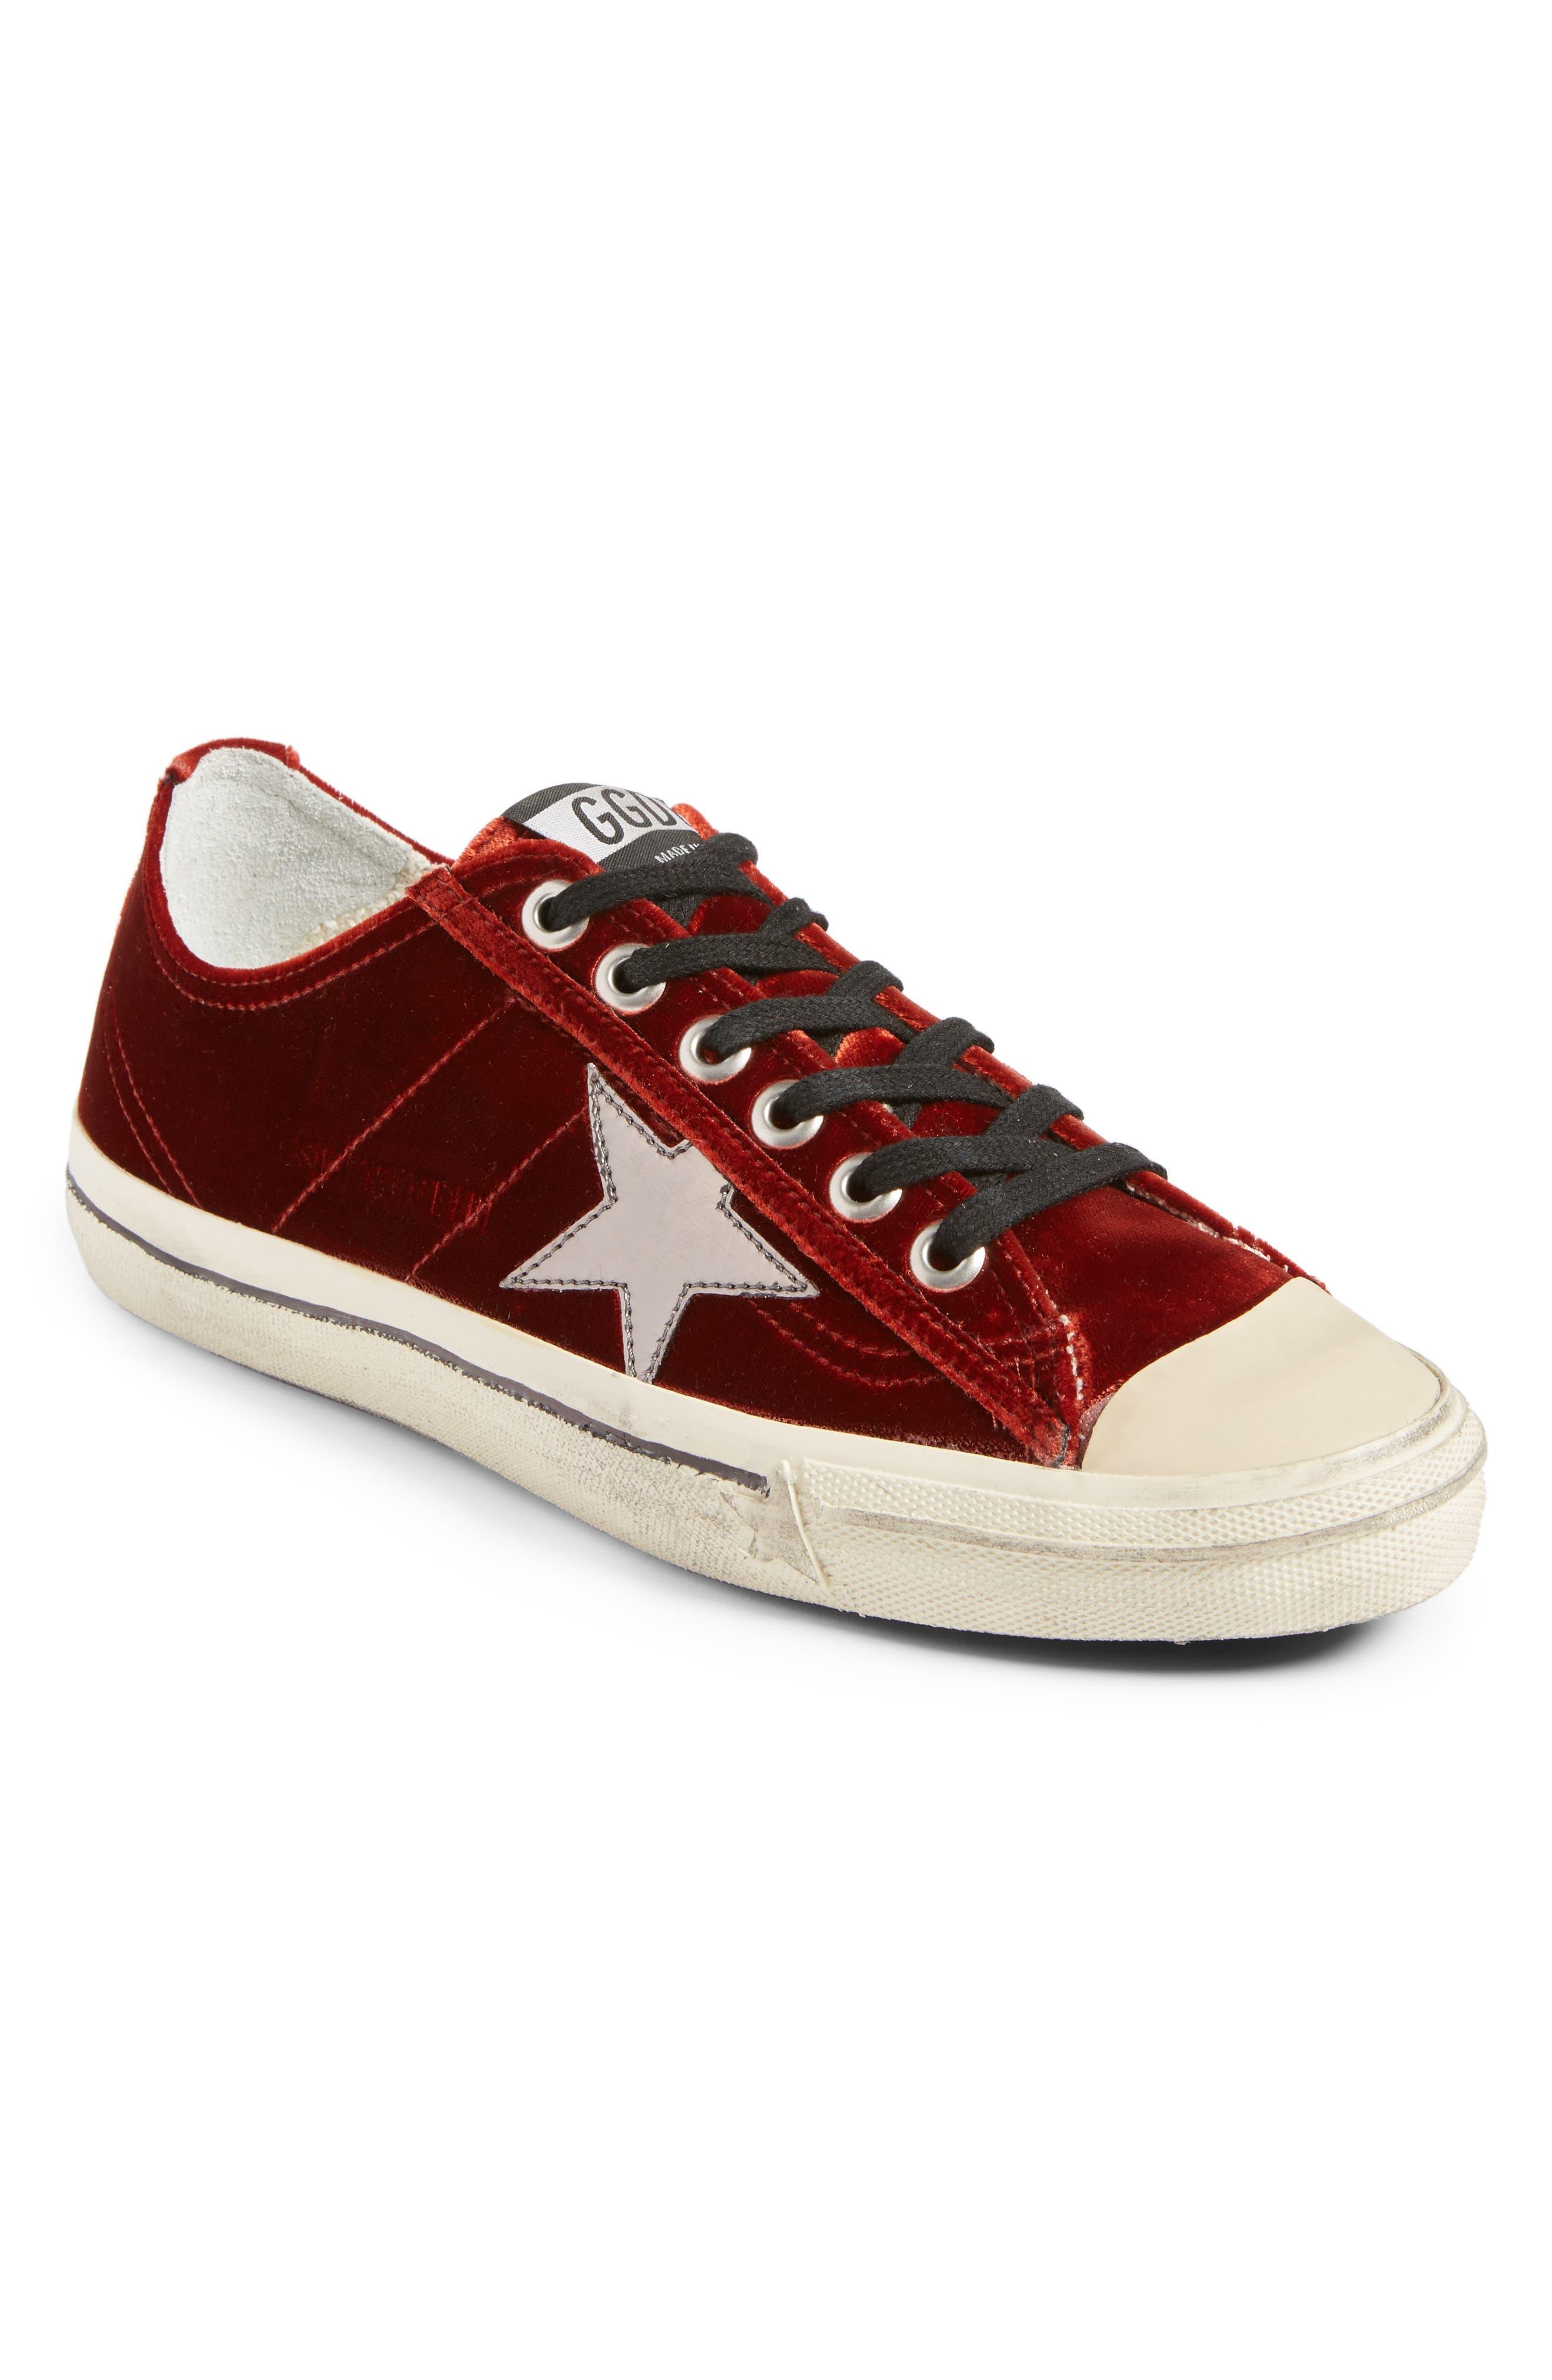 Alternate Image 1 Selected - Golden Goose V-Star 2 Low Top Sneaker (Women)